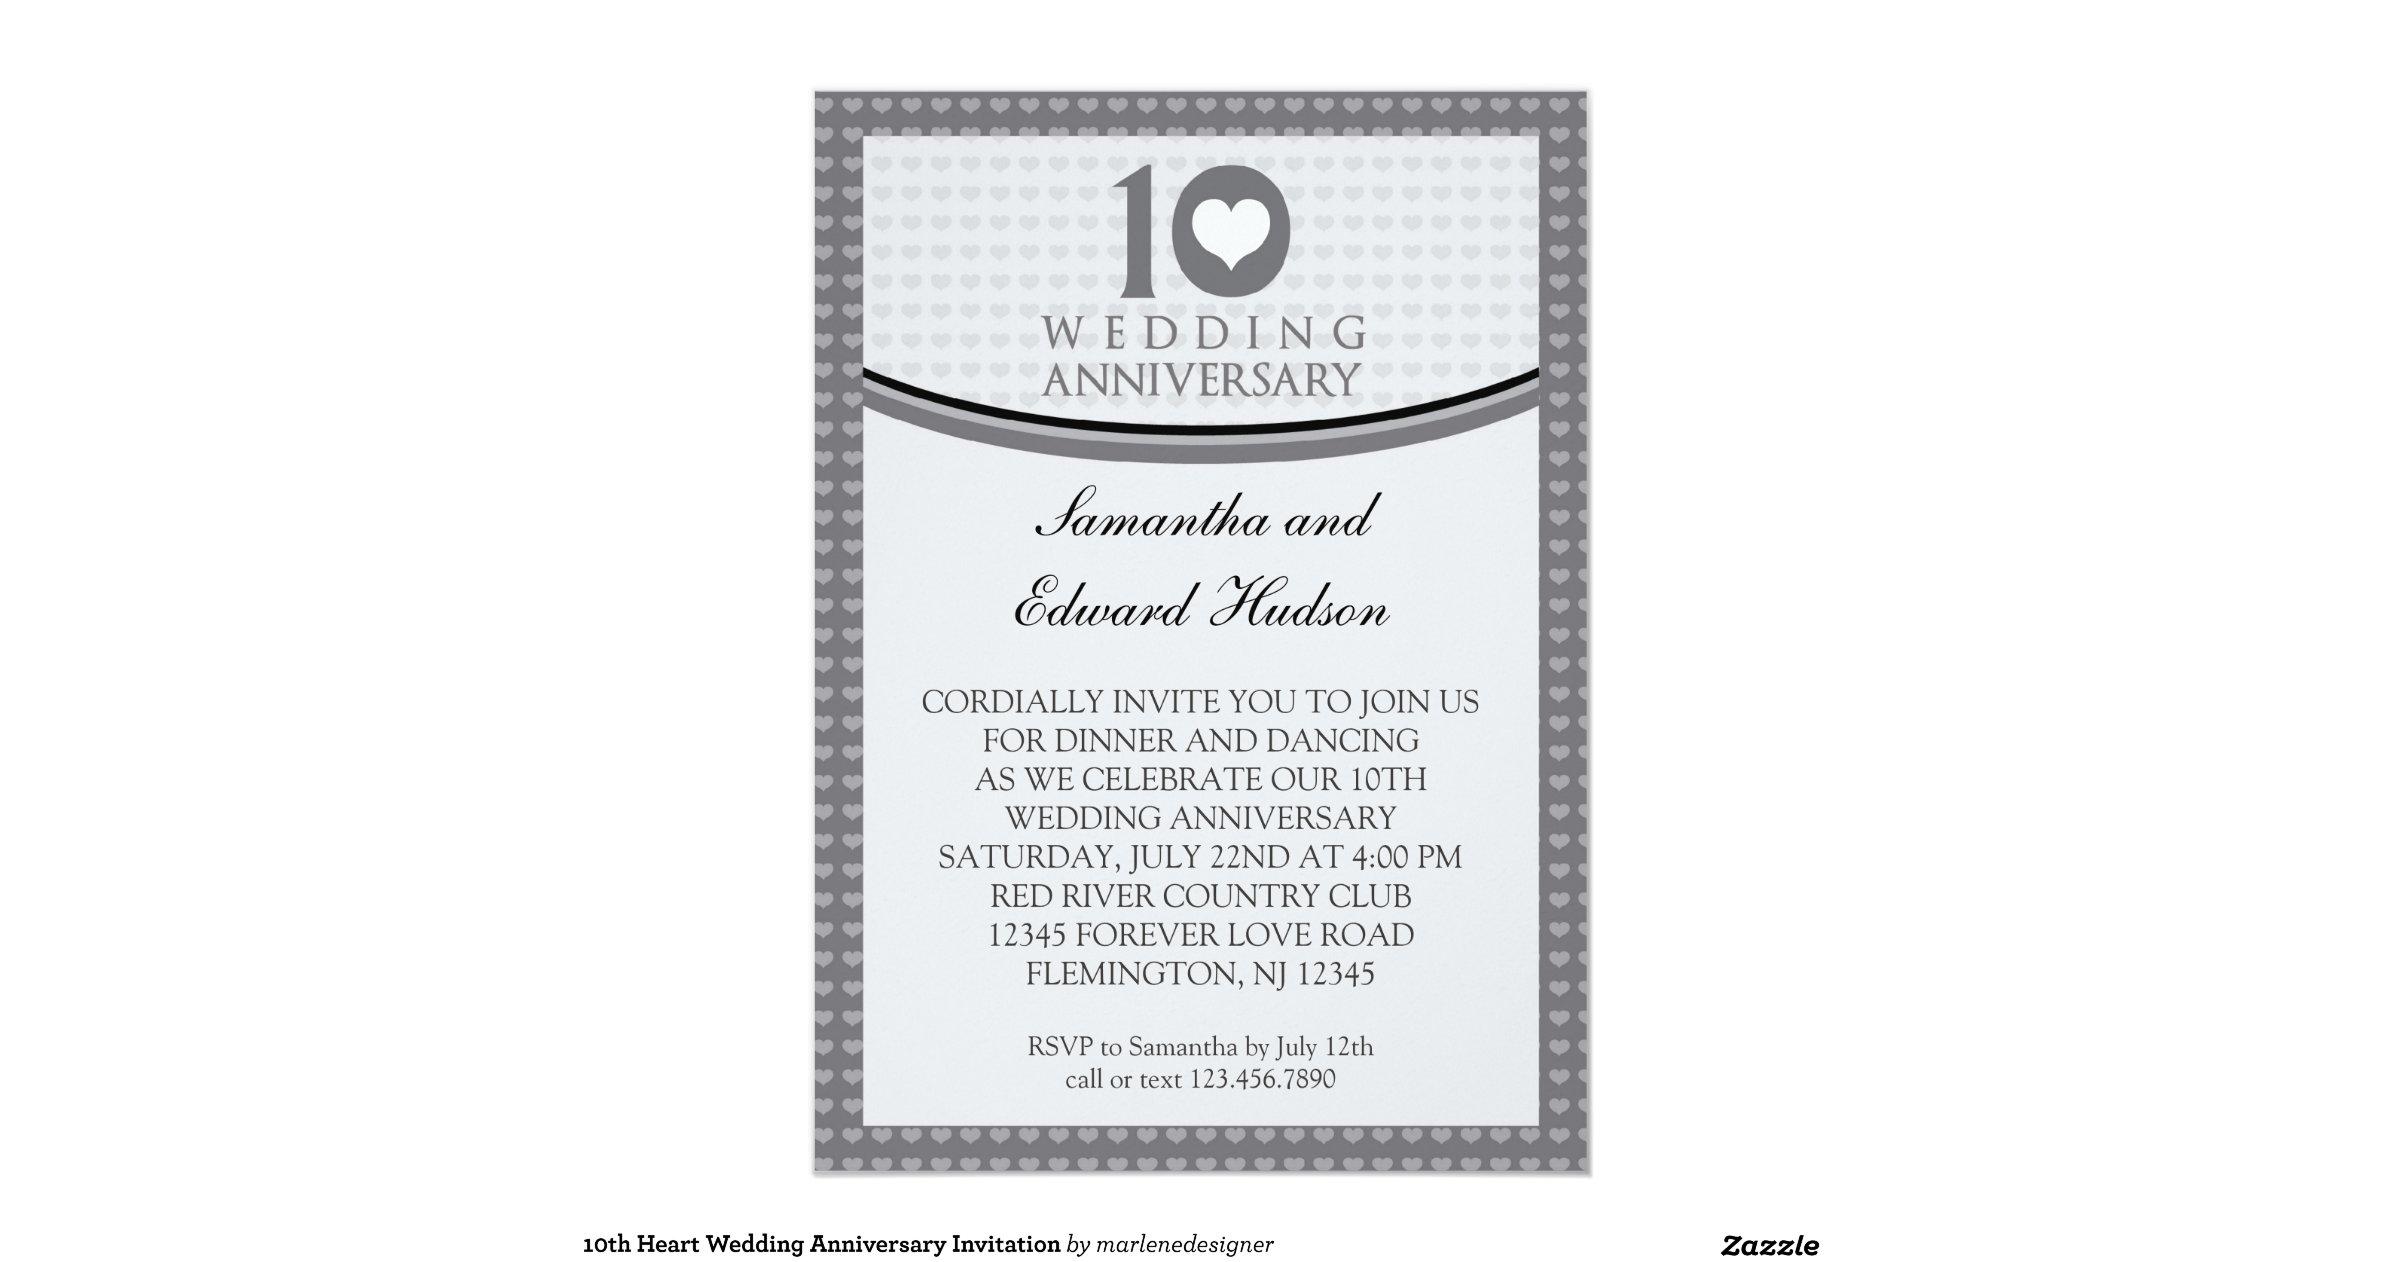 10th Wedding Anniversary Invitations: 10th_heart_wedding_anniversary_invitation